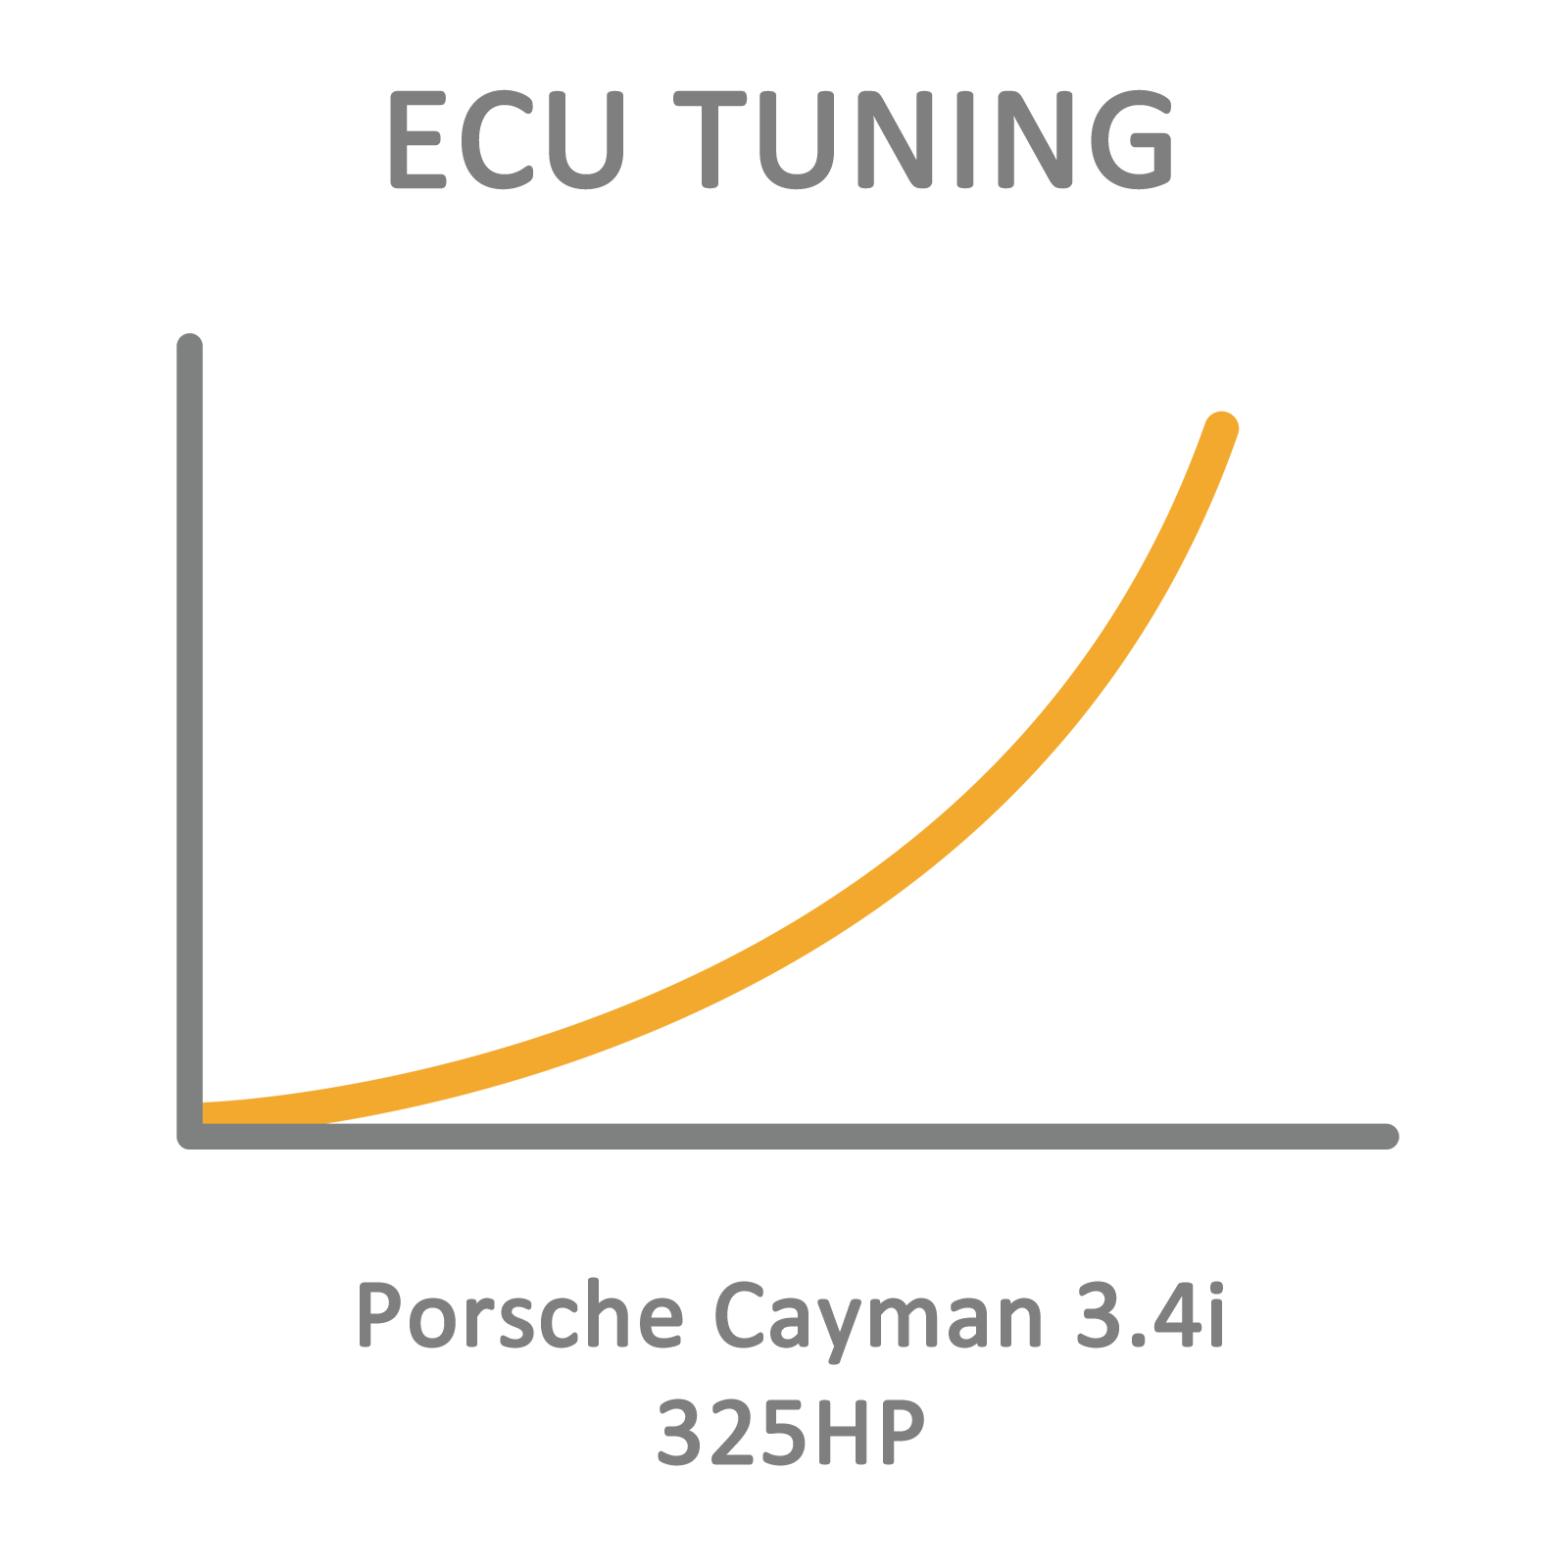 Porsche Cayman 3.4i 325HP ECU Tuning Remapping Programming